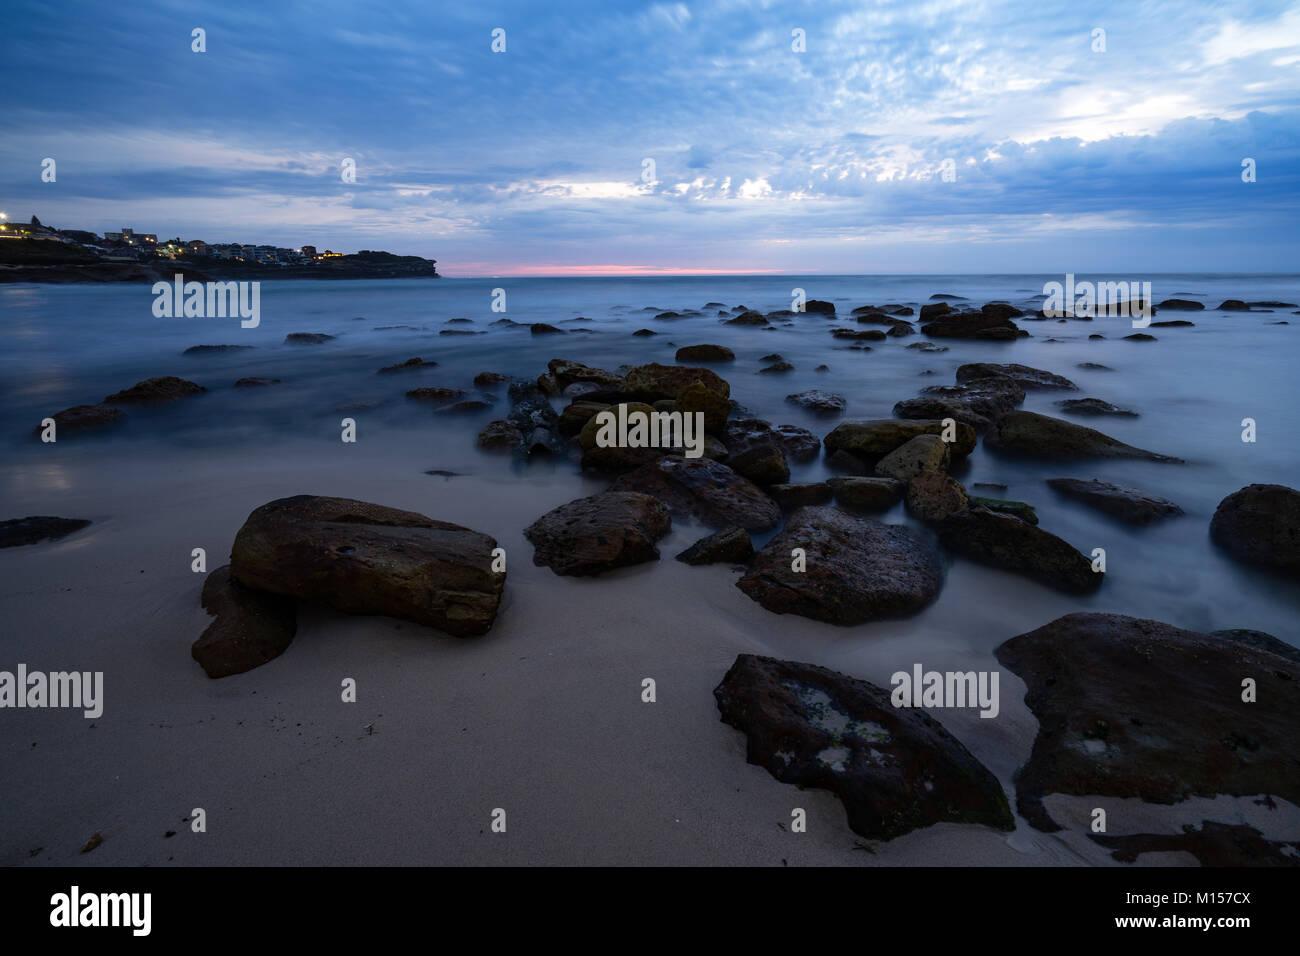 Cloudy sunrise at Bronte beach - Stock Image